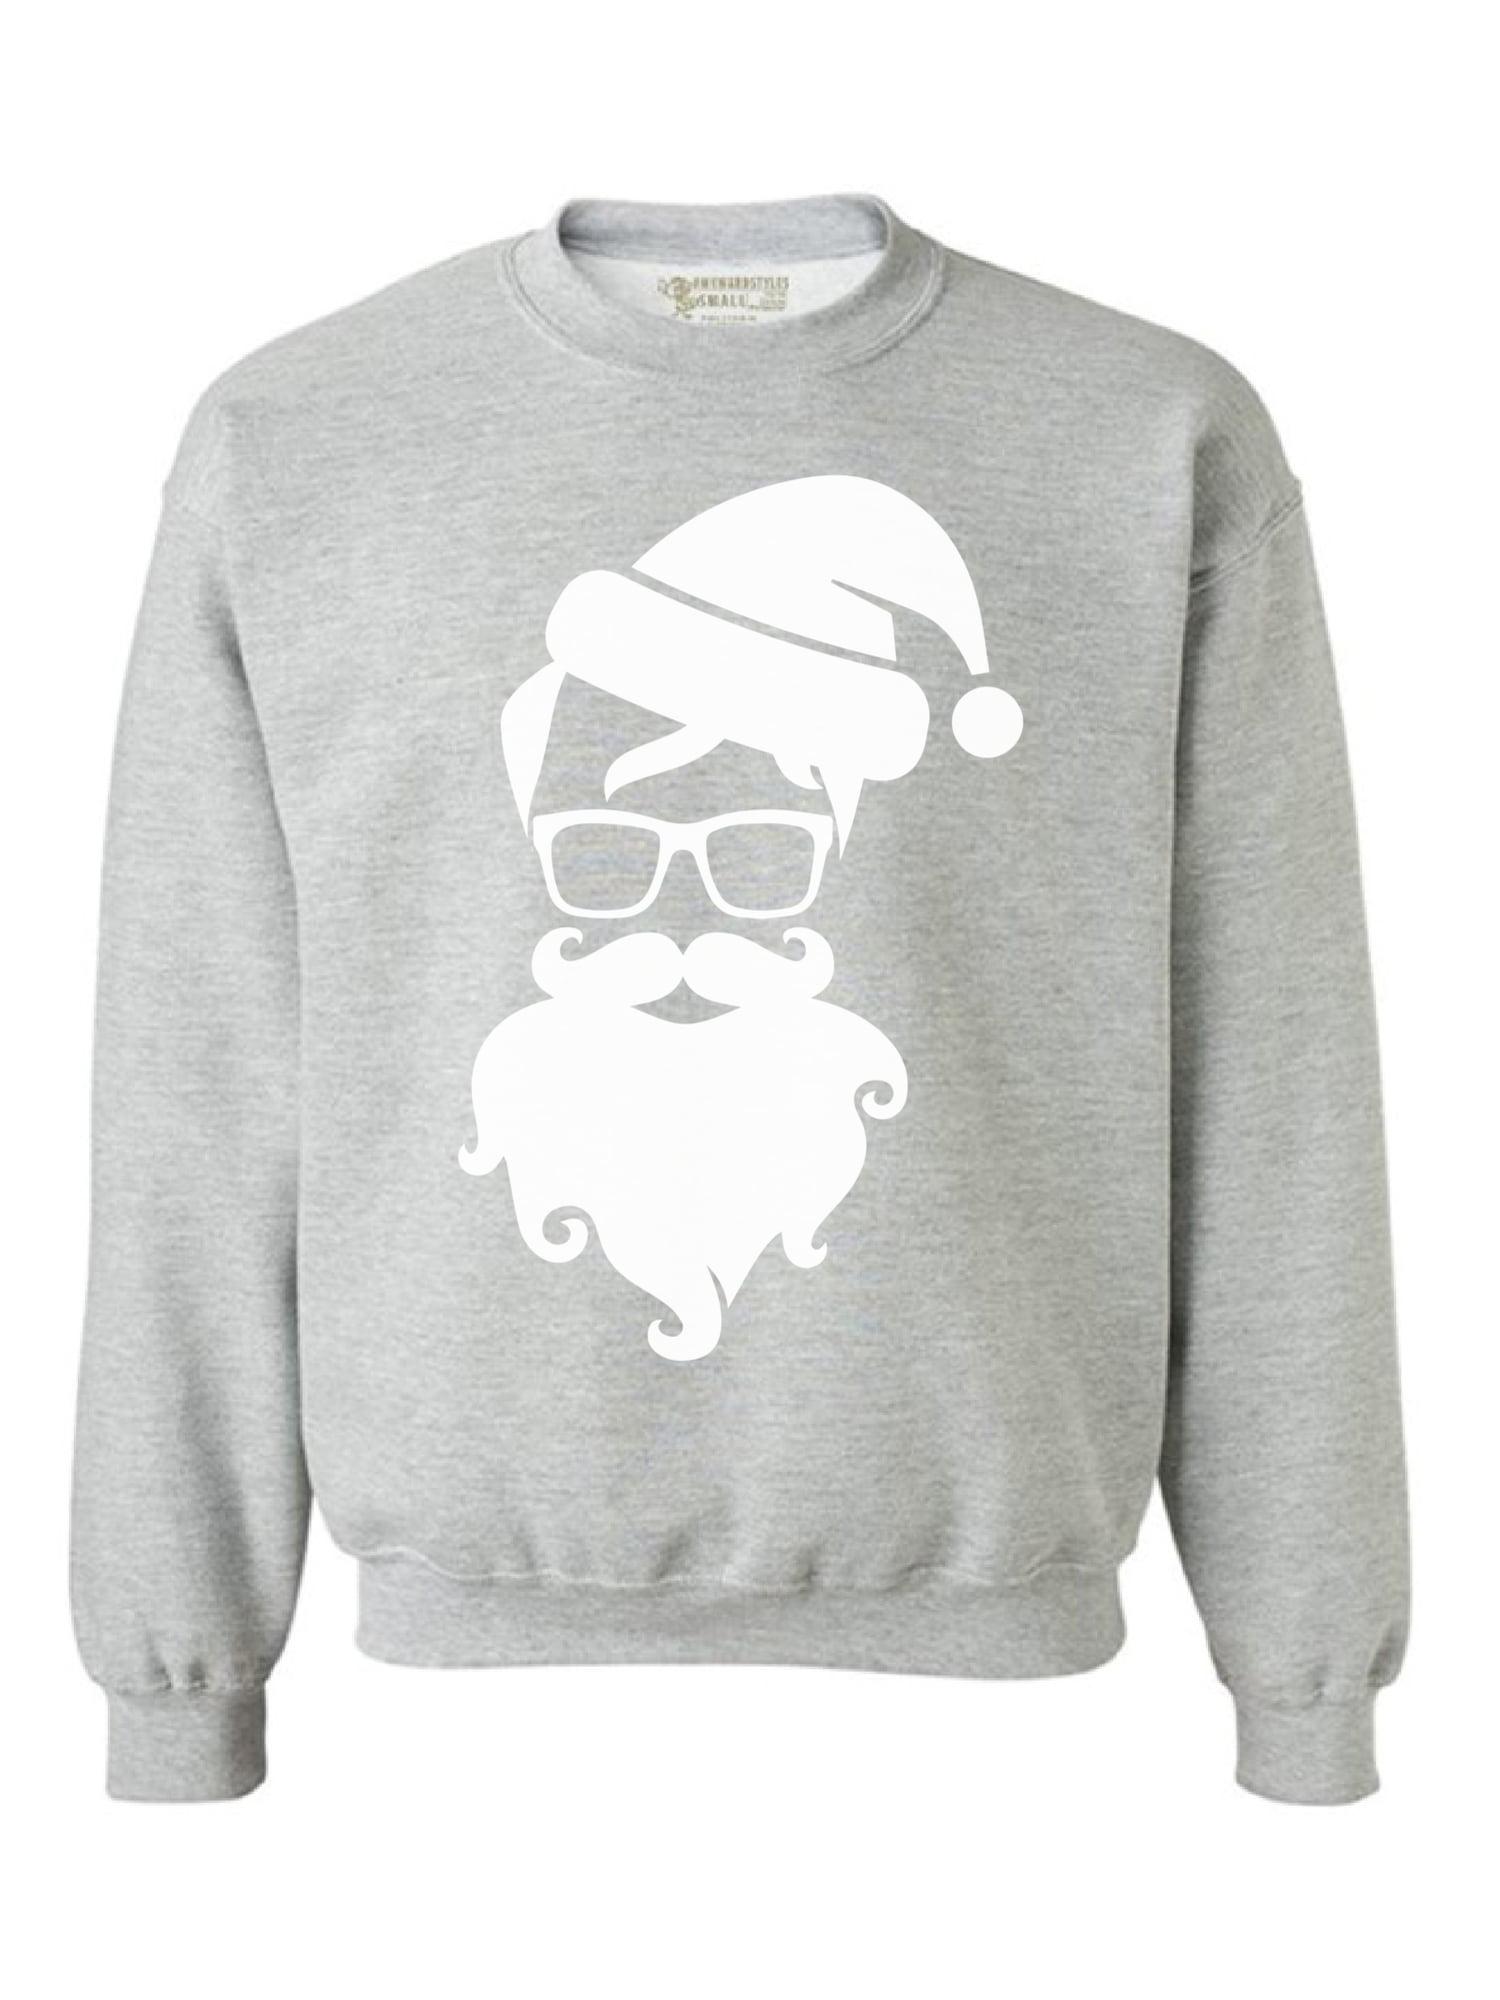 Modern Kids Unisex Toddler Christmas Santa Claus T-Shirt Size 3T